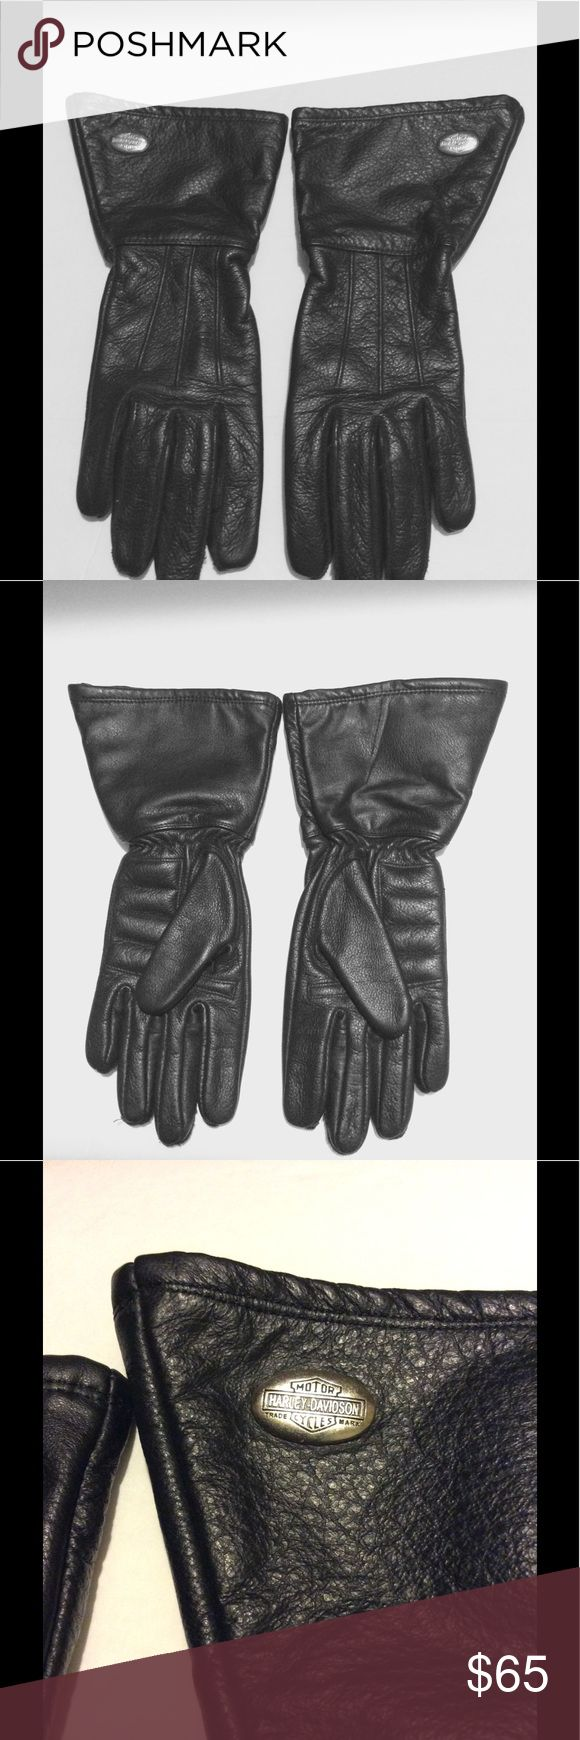 Womens black leather gloves medium -  Nwot Harley Davidson Womens Bike Gloves